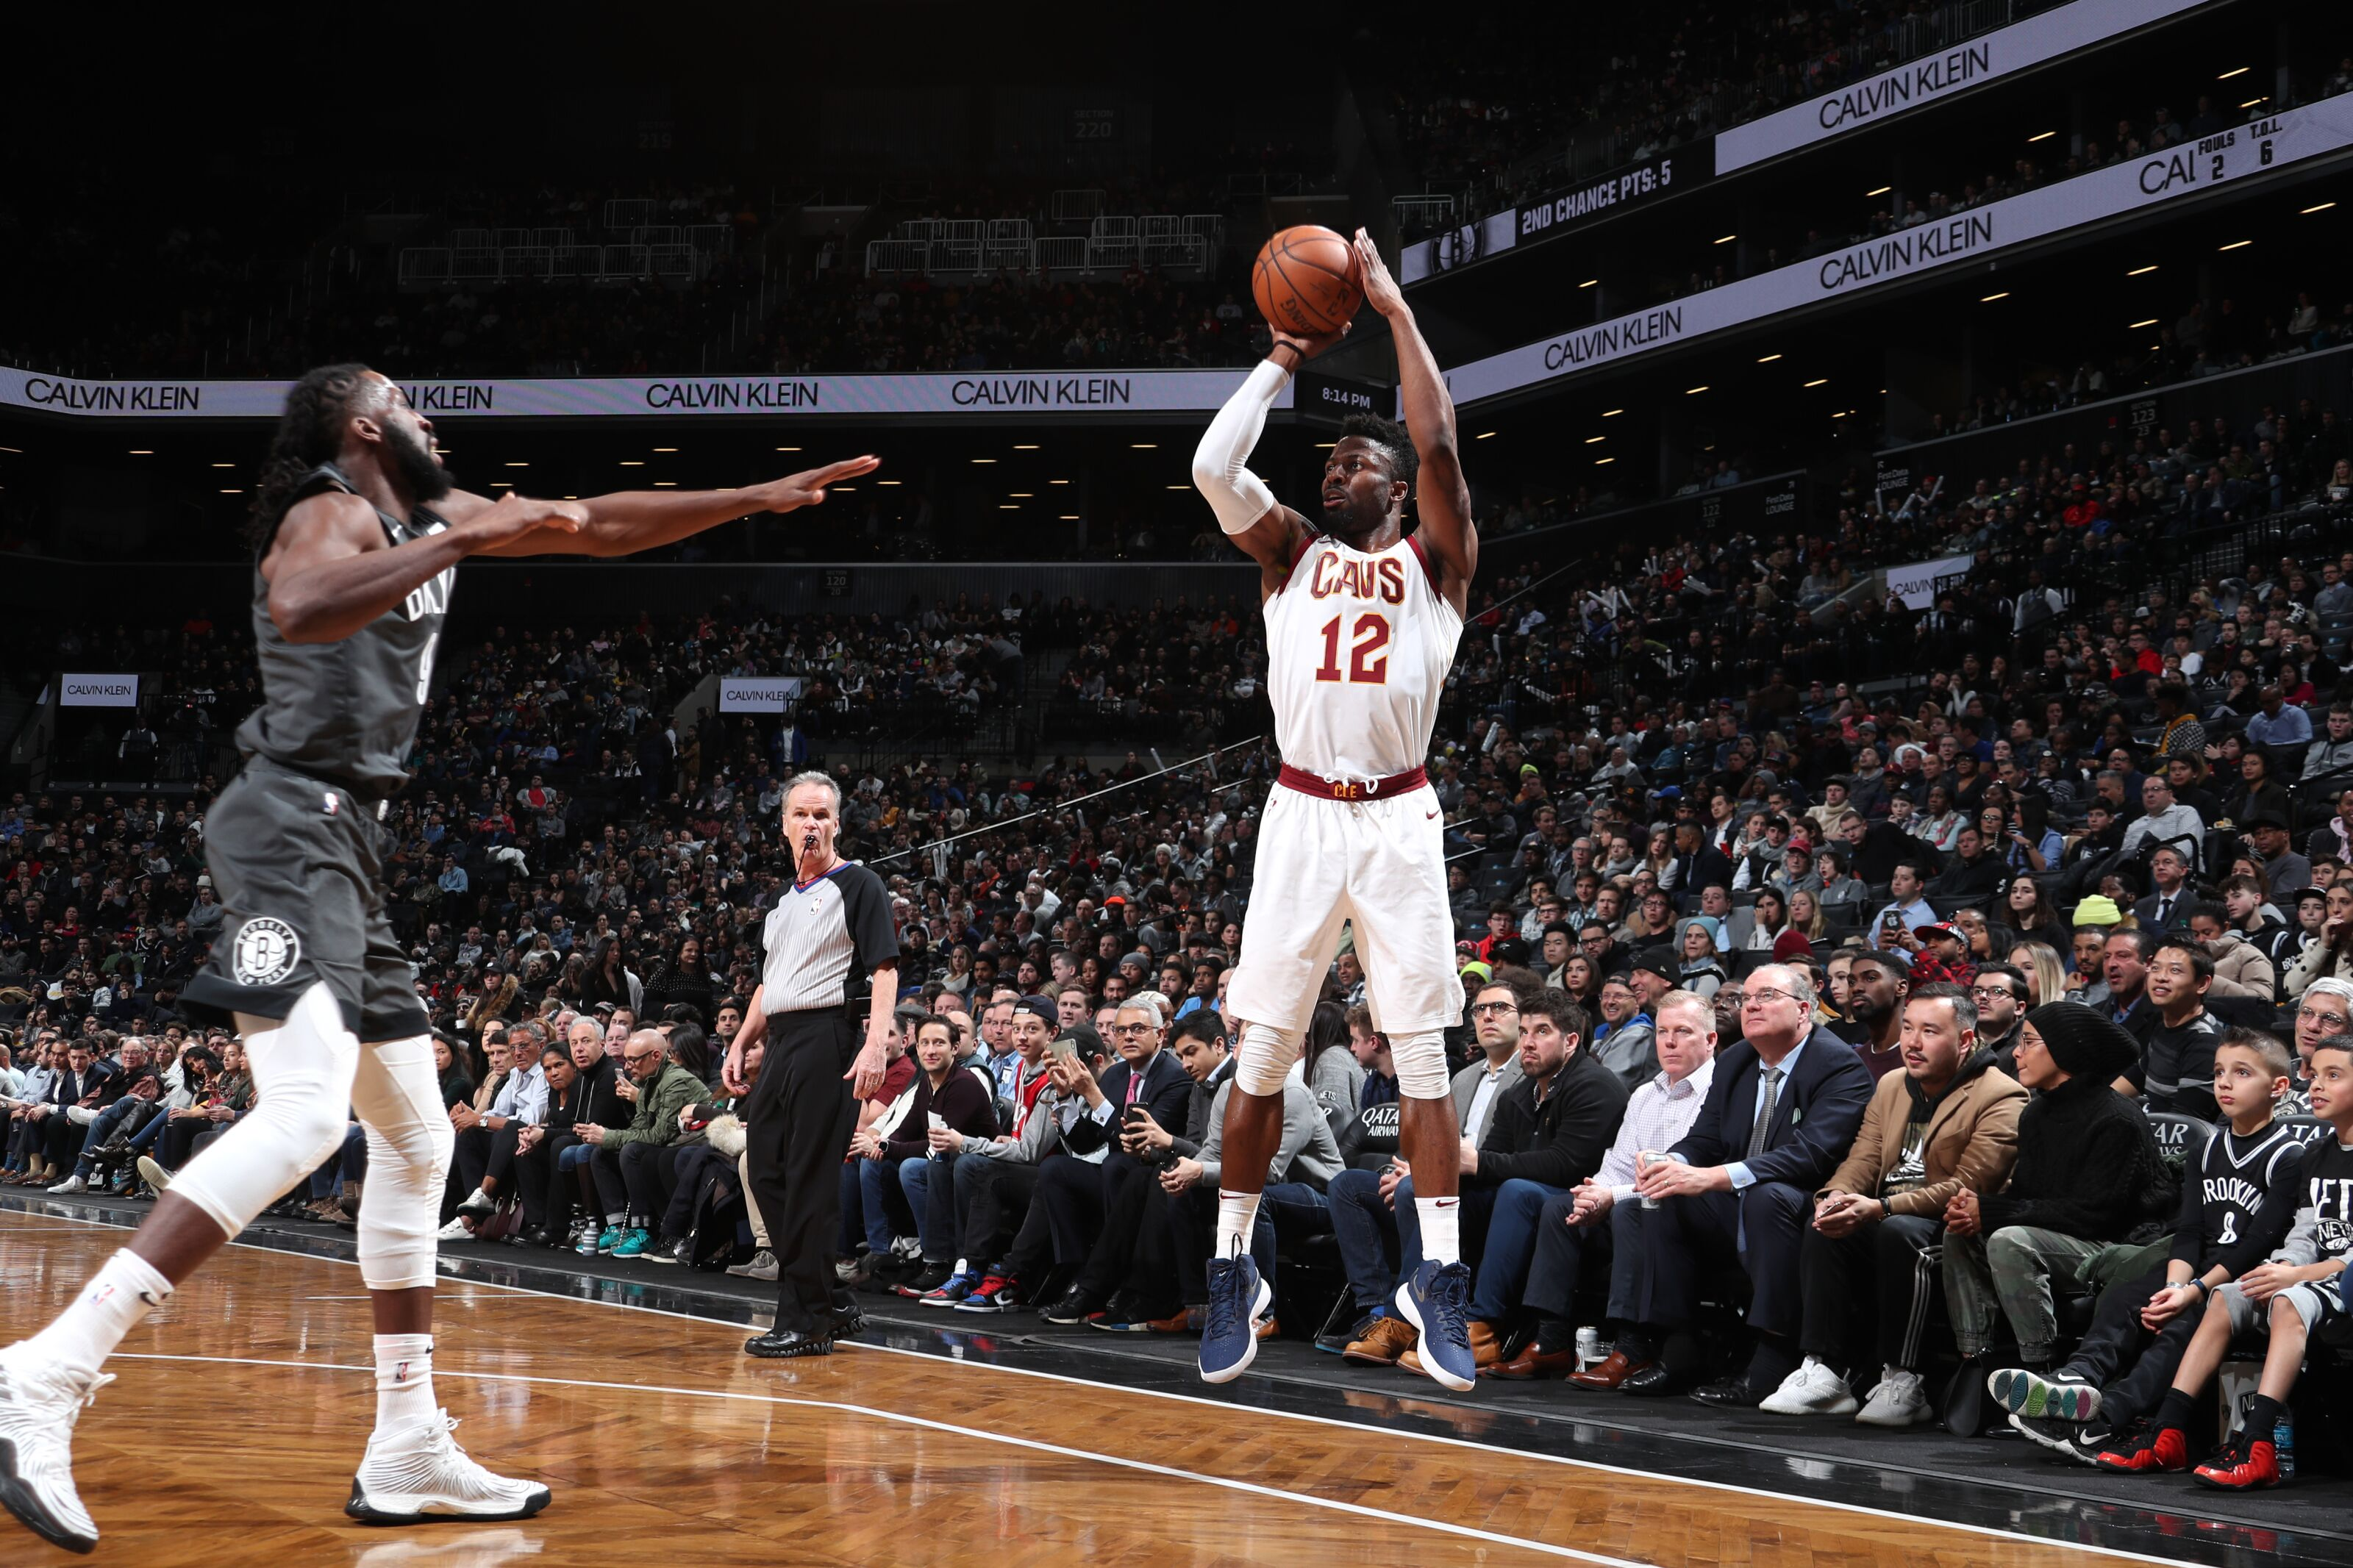 Brooklyn Nets: 3 things David Nwaba brings to the table